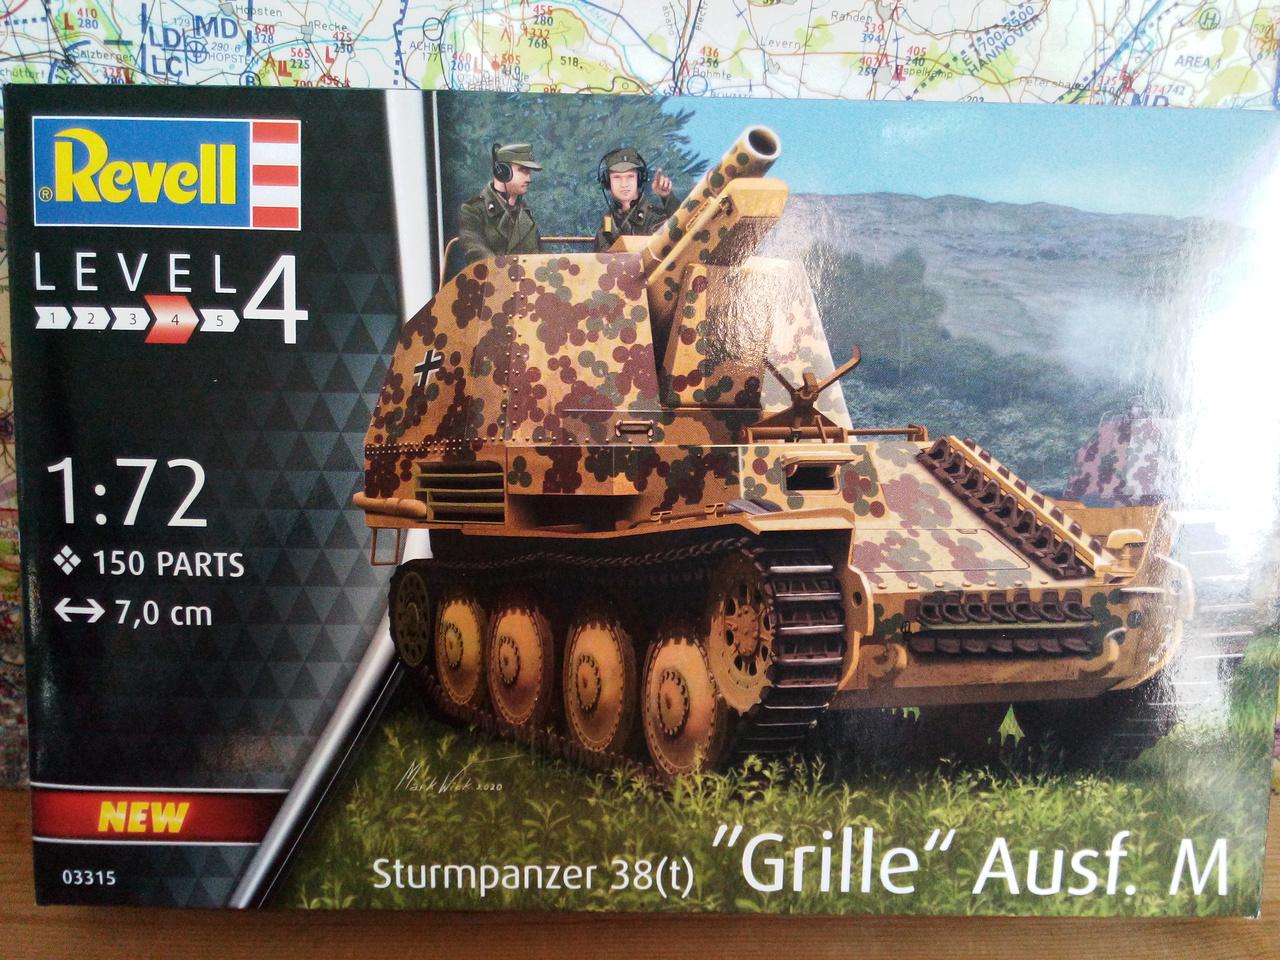 Sturmpanzer 38t  Grille  Ausf. M Img_20210305_103839wbjiv